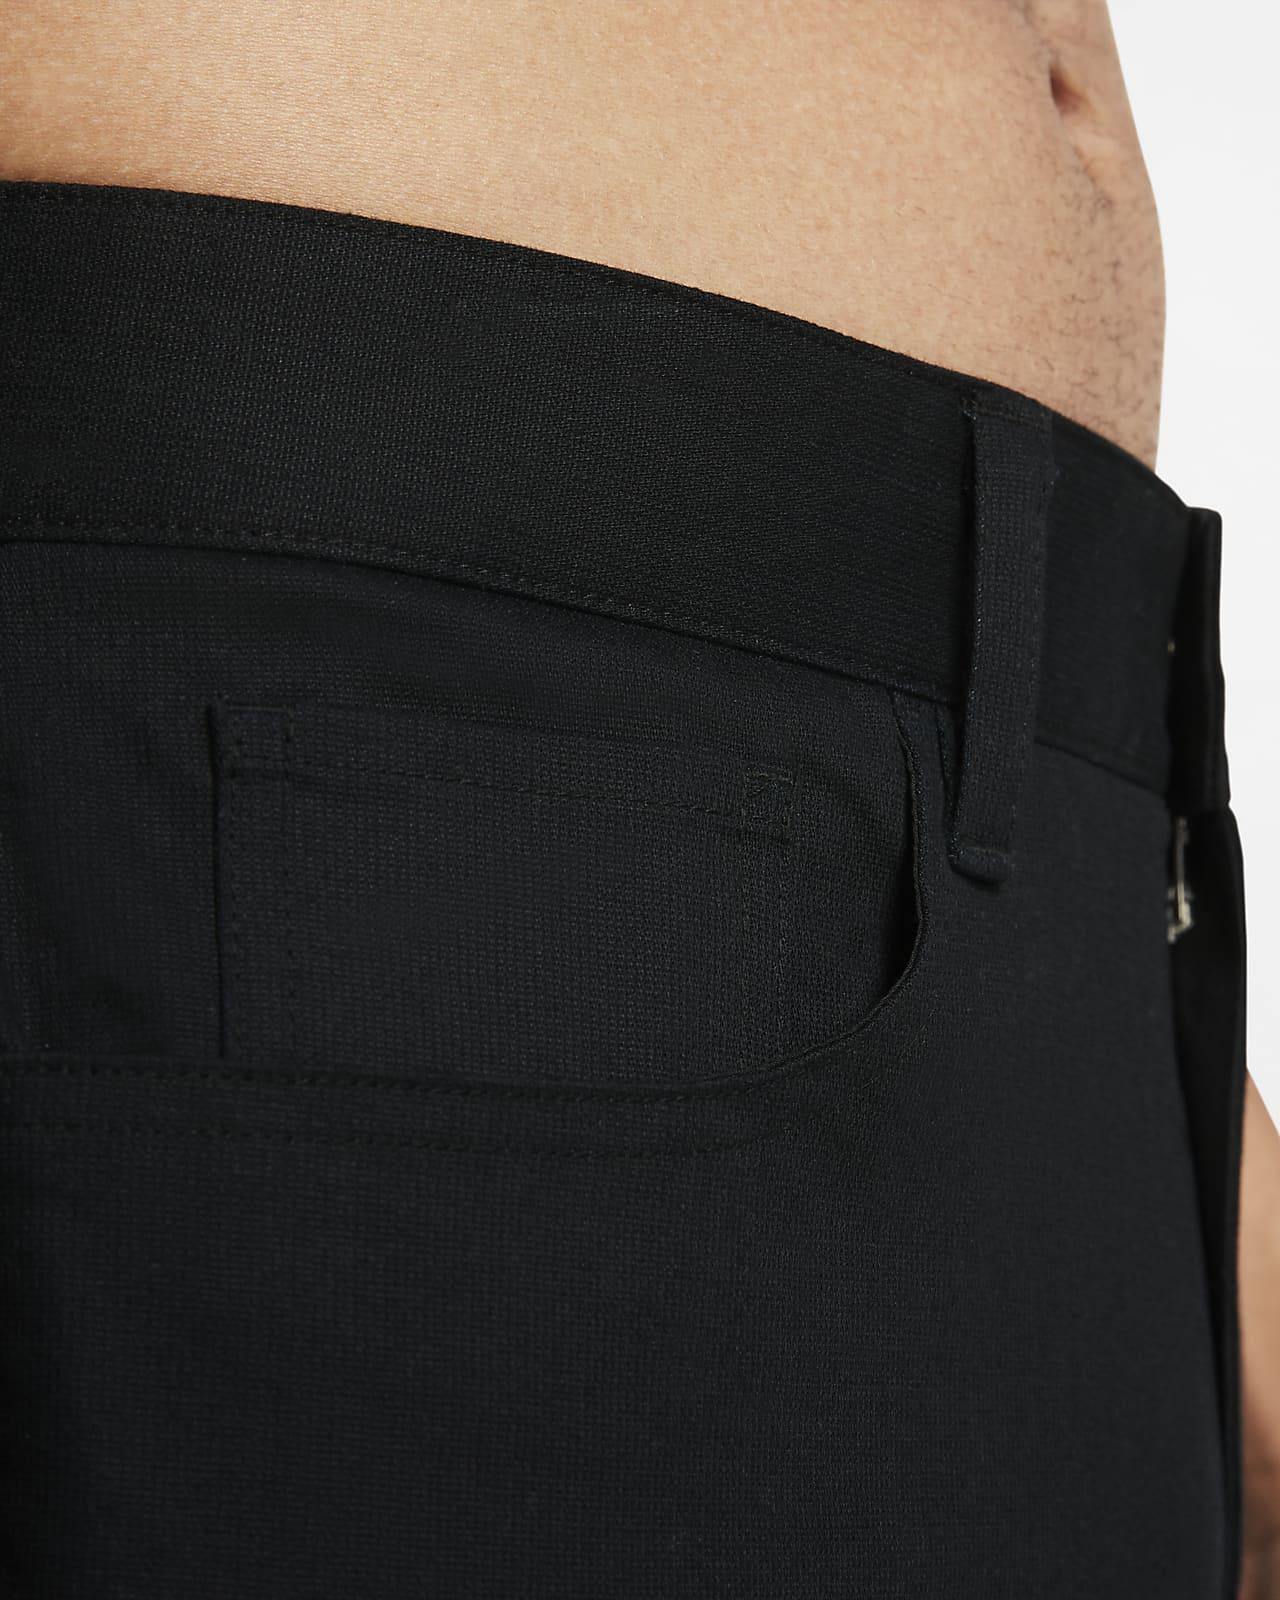 Hurley Mens 84 Storm Cotton Pant